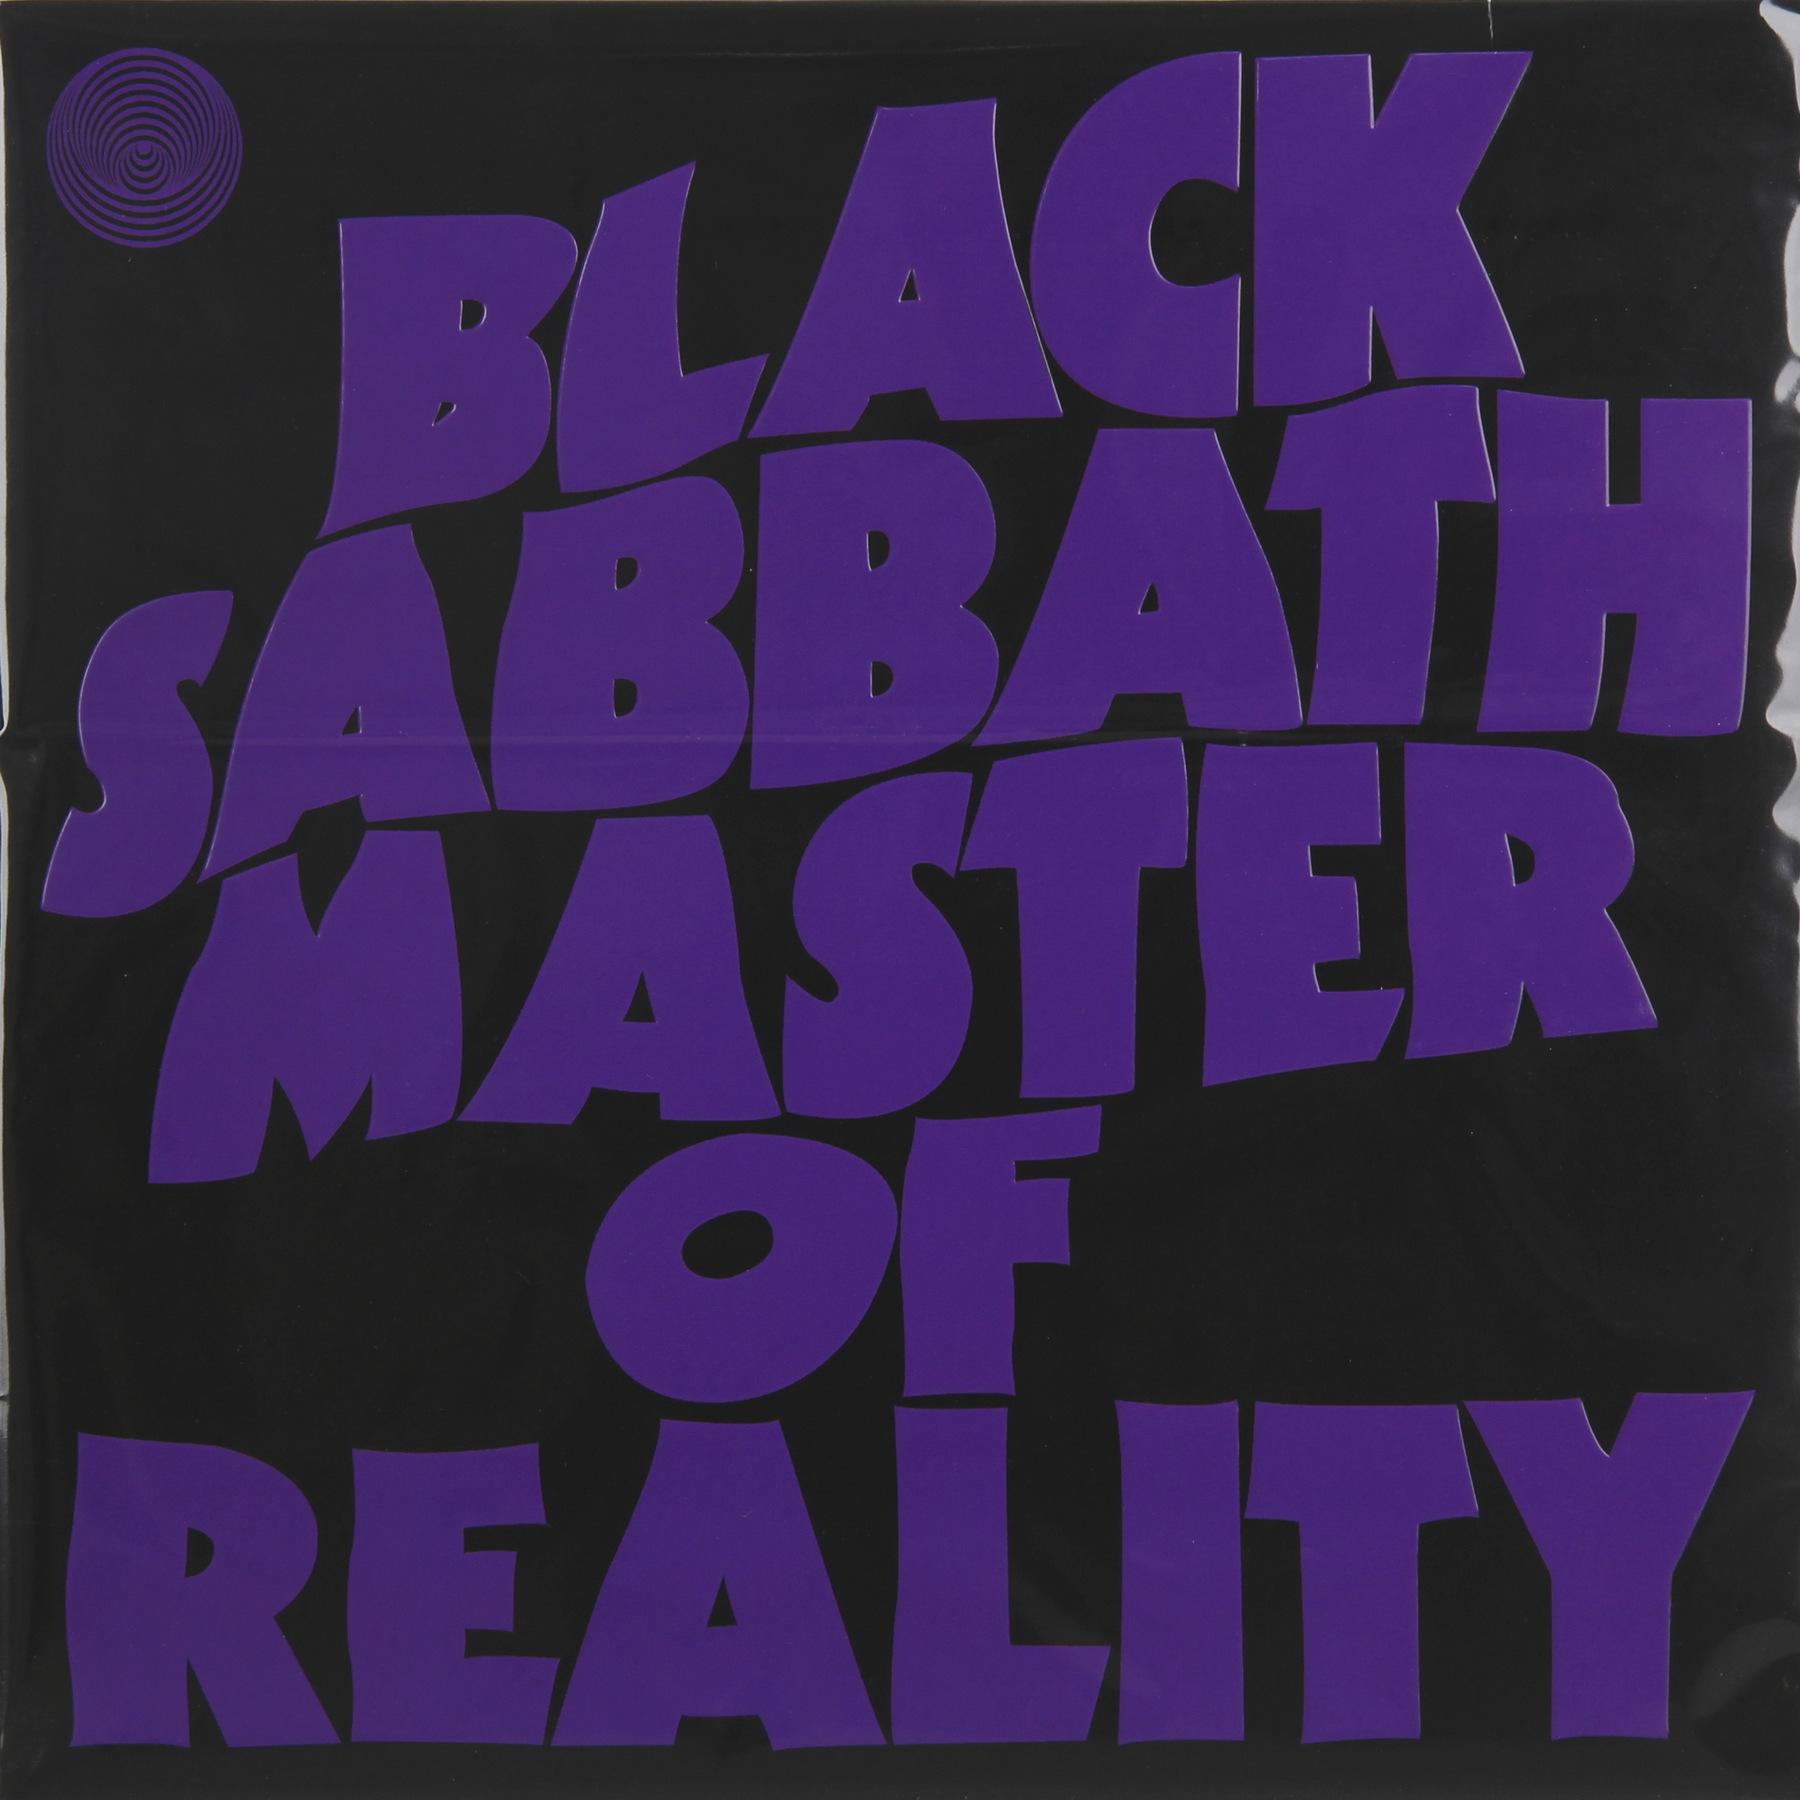 kim-black-sabbath-master-of-reality-sex-pantyhose